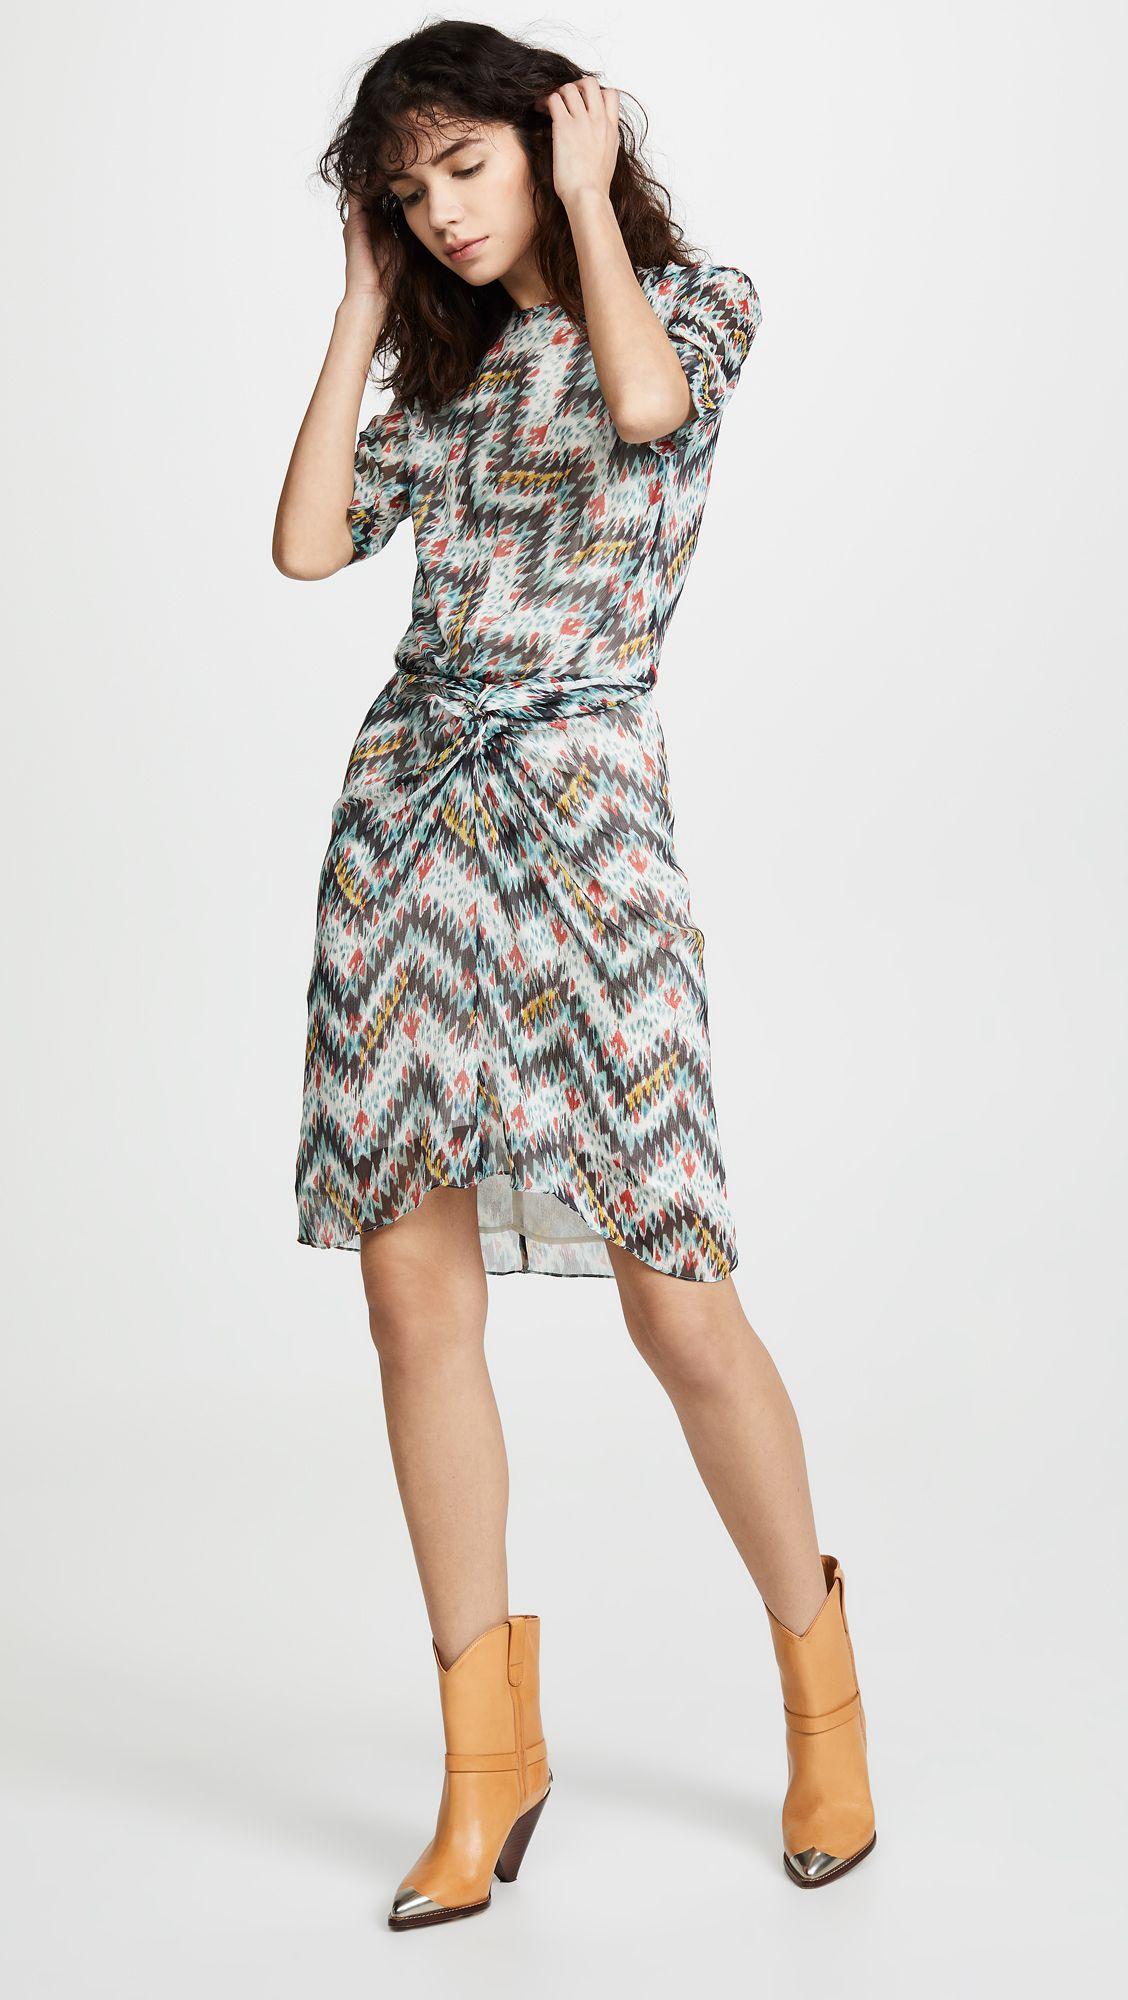 43e904c1f8e499 Isabel Marant Etoile Barden Dress